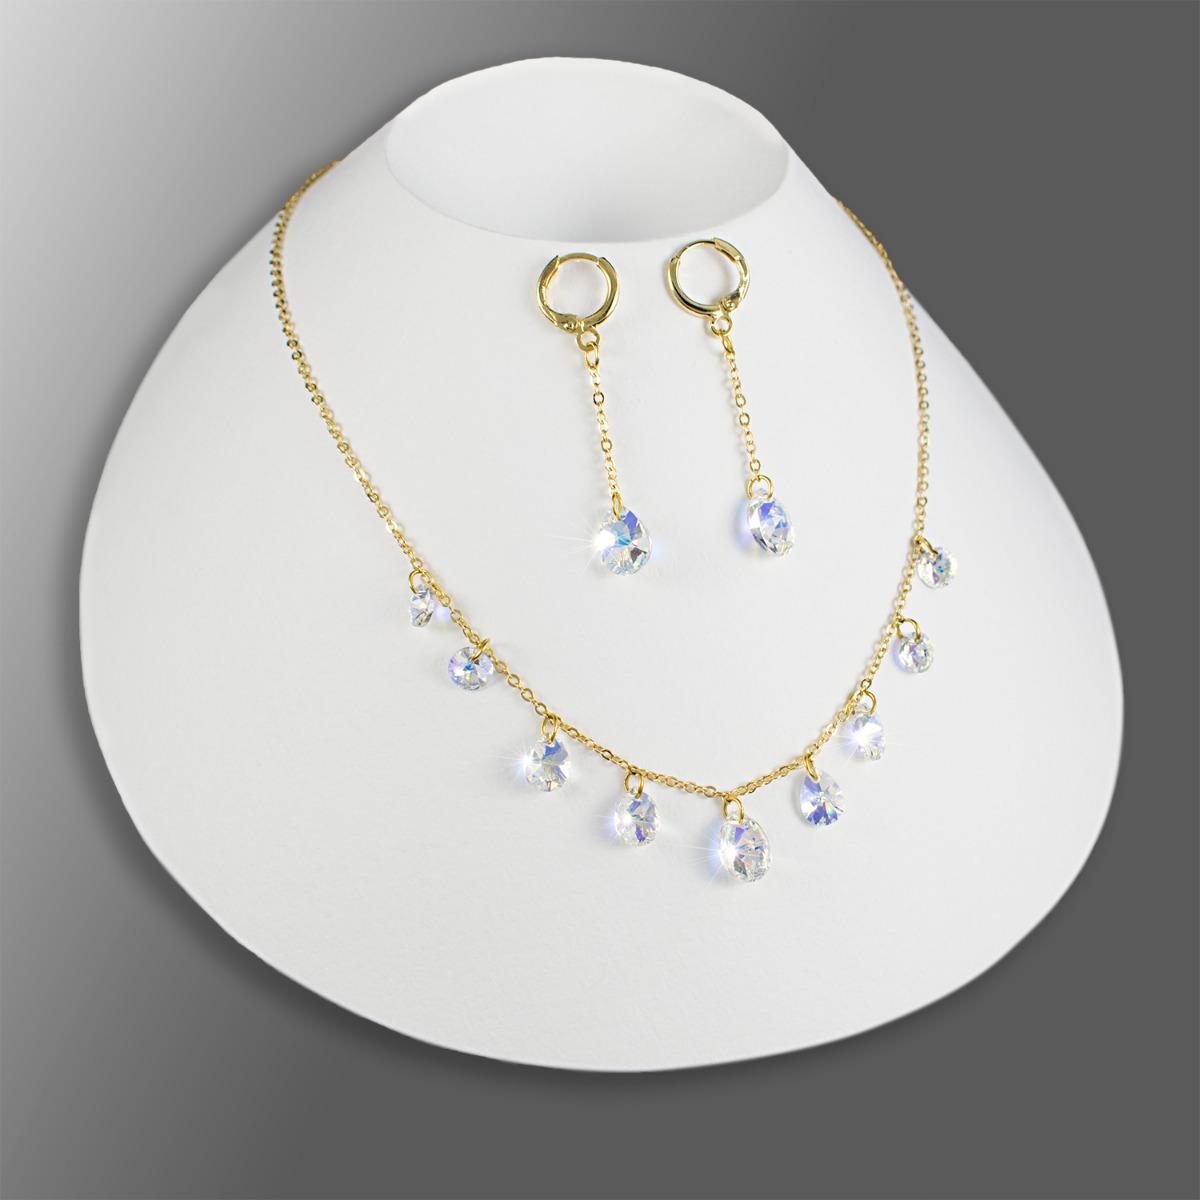 42f043a635db collares mujer aretes pulsera cristal swarovski cadena oro g. Cargando zoom.